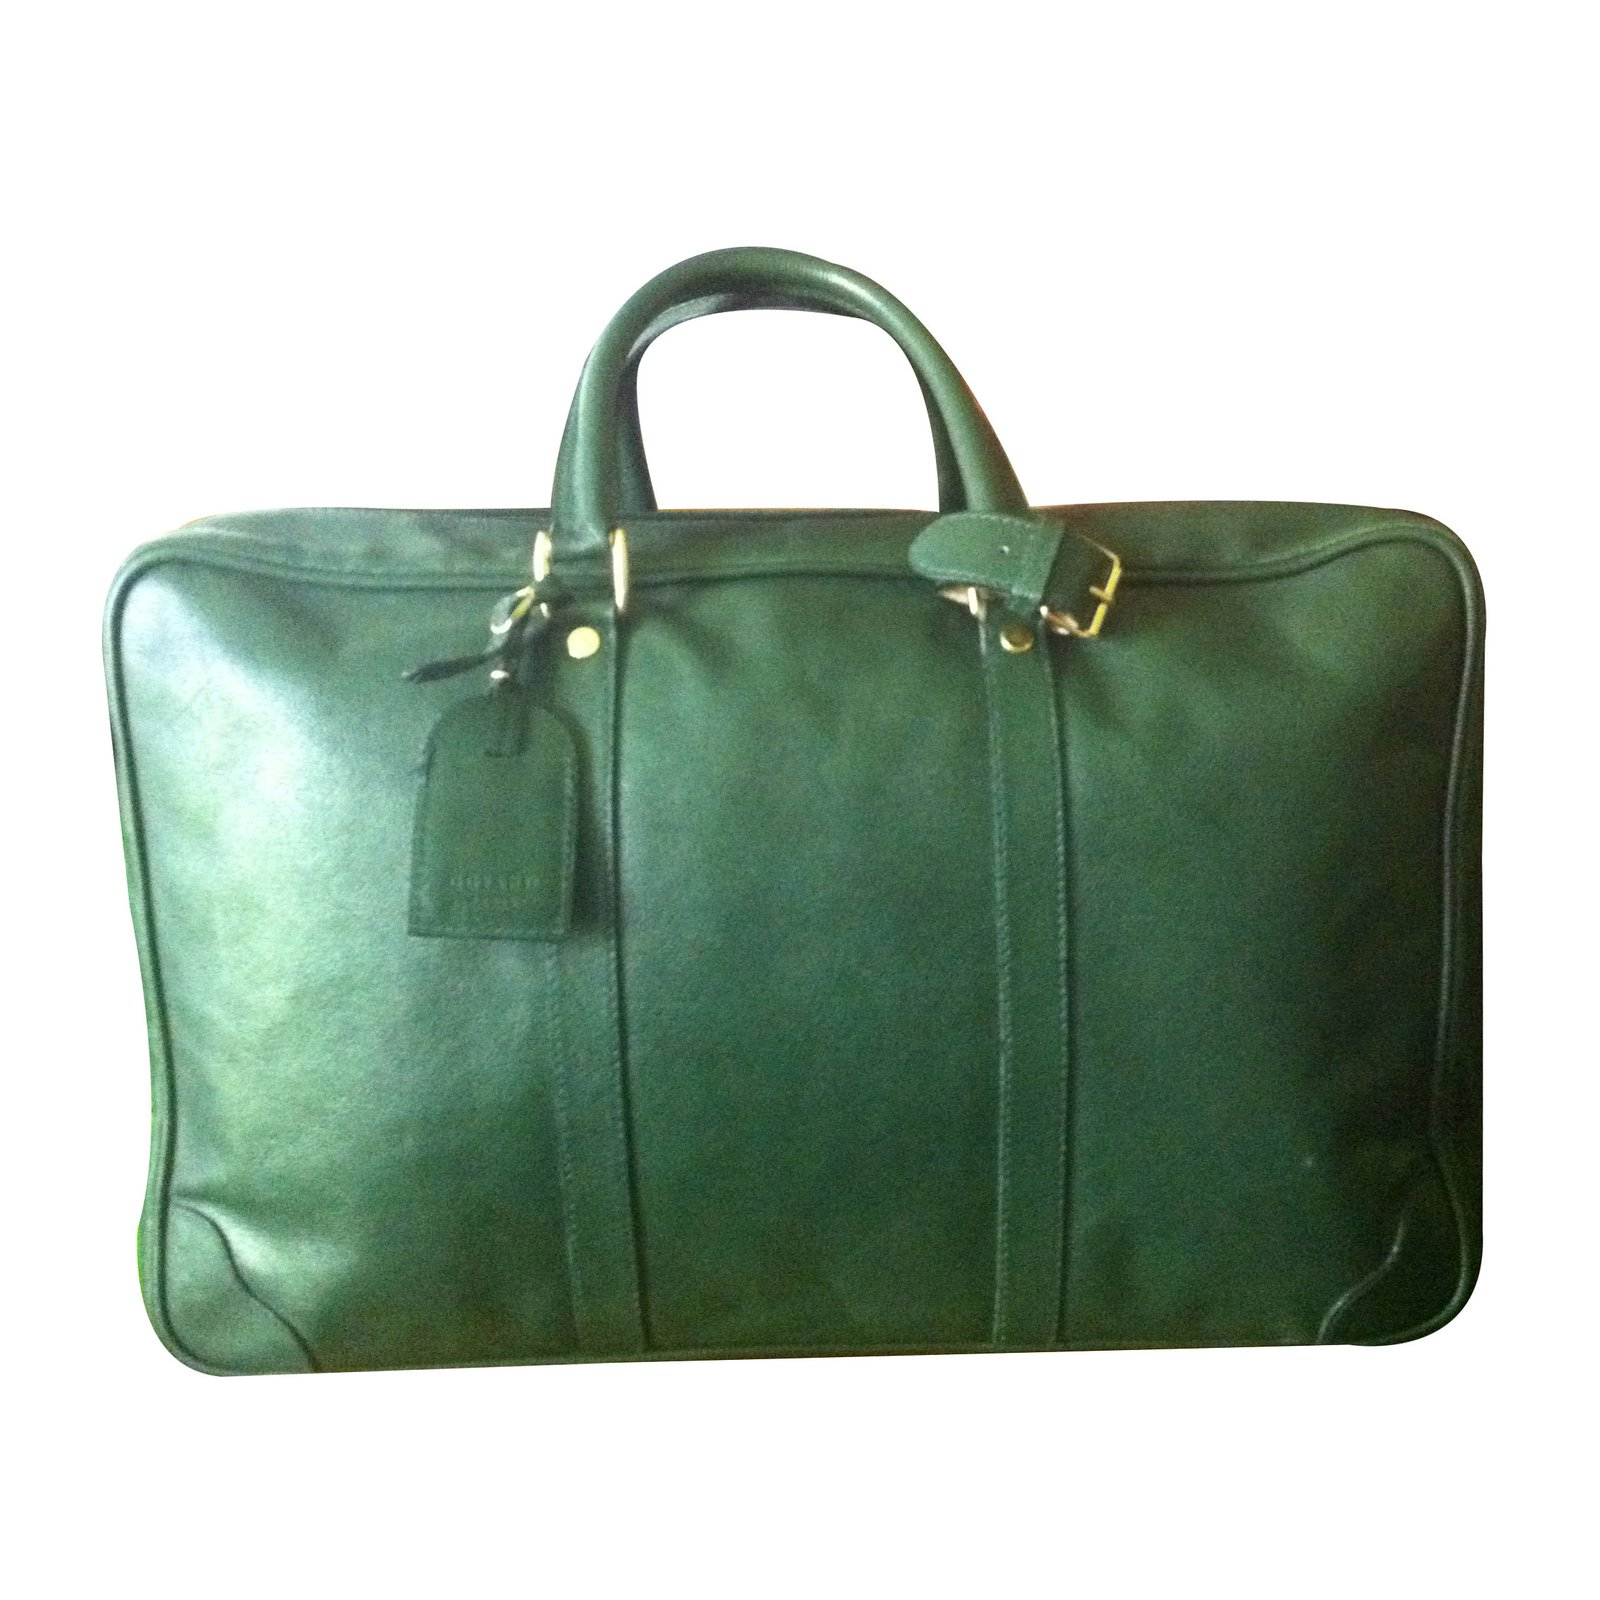 sacs de voyage goyard sacs de voyage cuir vert joli closet. Black Bedroom Furniture Sets. Home Design Ideas